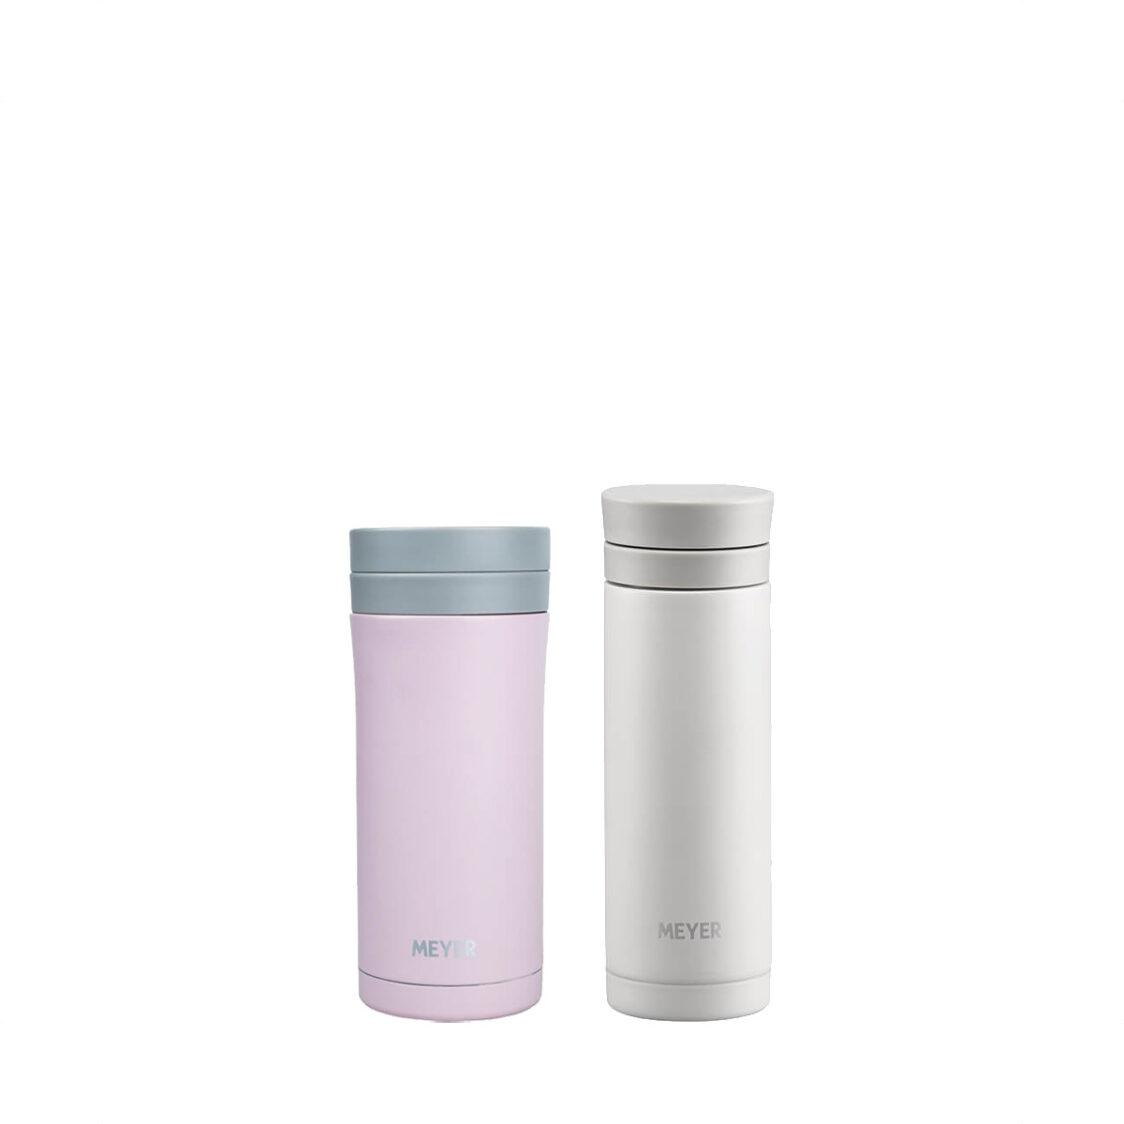 Meyer 250ml Vacuum Mug Light Beige  330ml Vacuum Flask Light Pink